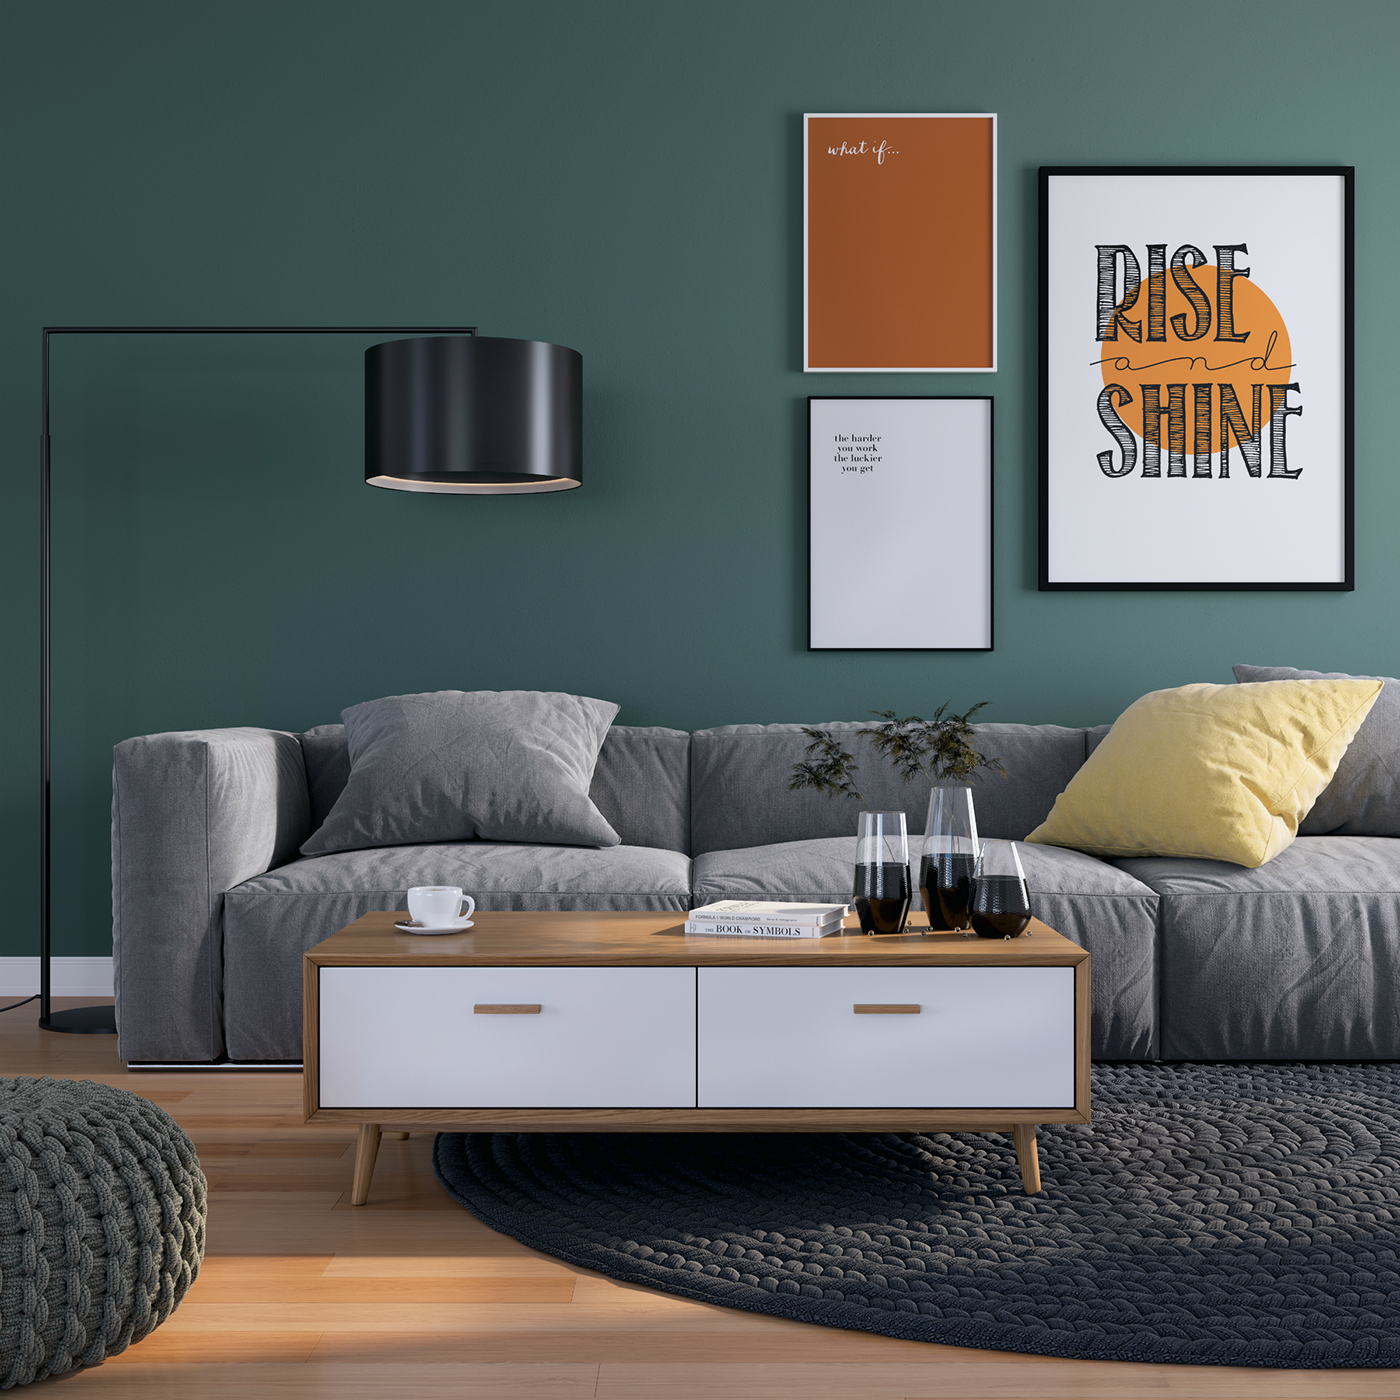 Furniture Catalog Online: 3d Renderings For A Furniture Catalog On Behance